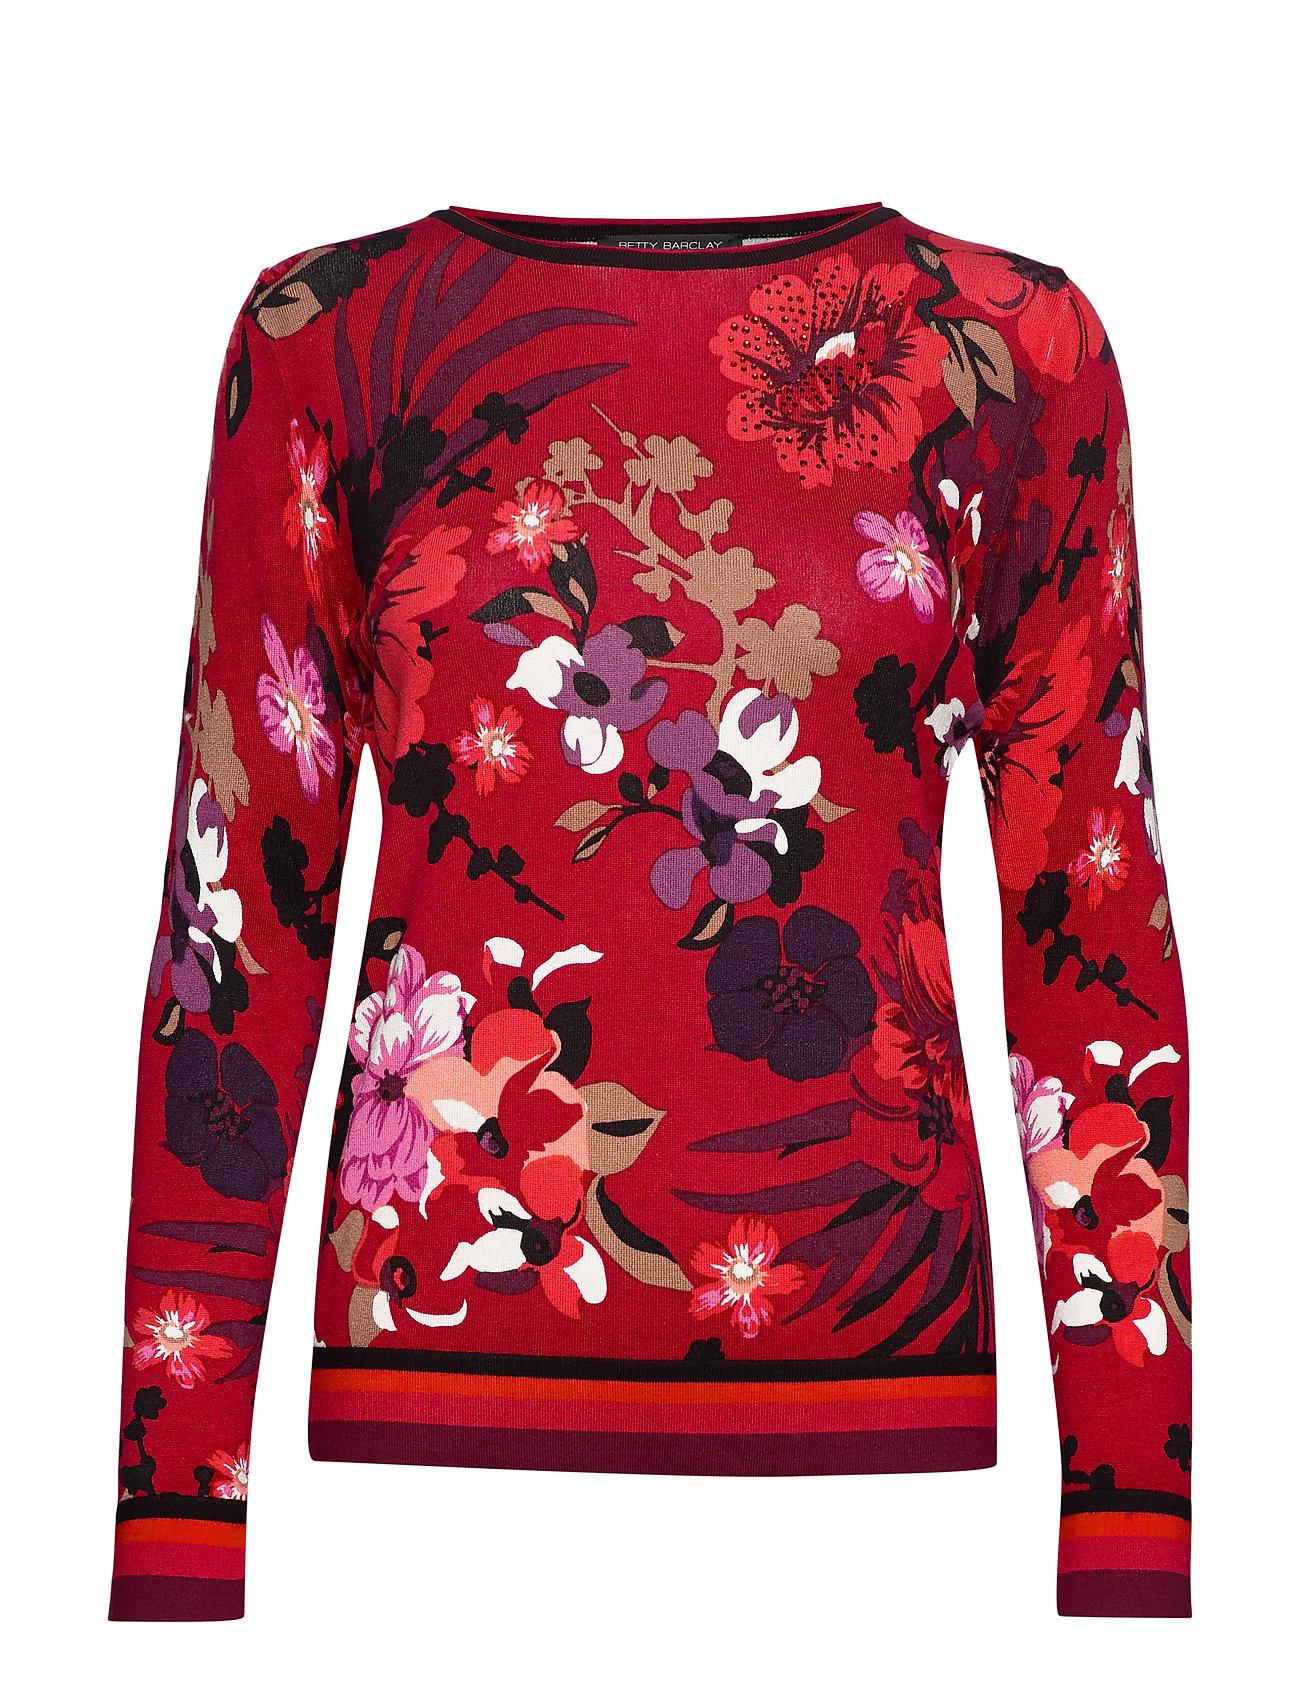 Image of Knitted Pullover Short 1/1 Sle Strikket Trøje Rød Betty Barclay (3228632113)